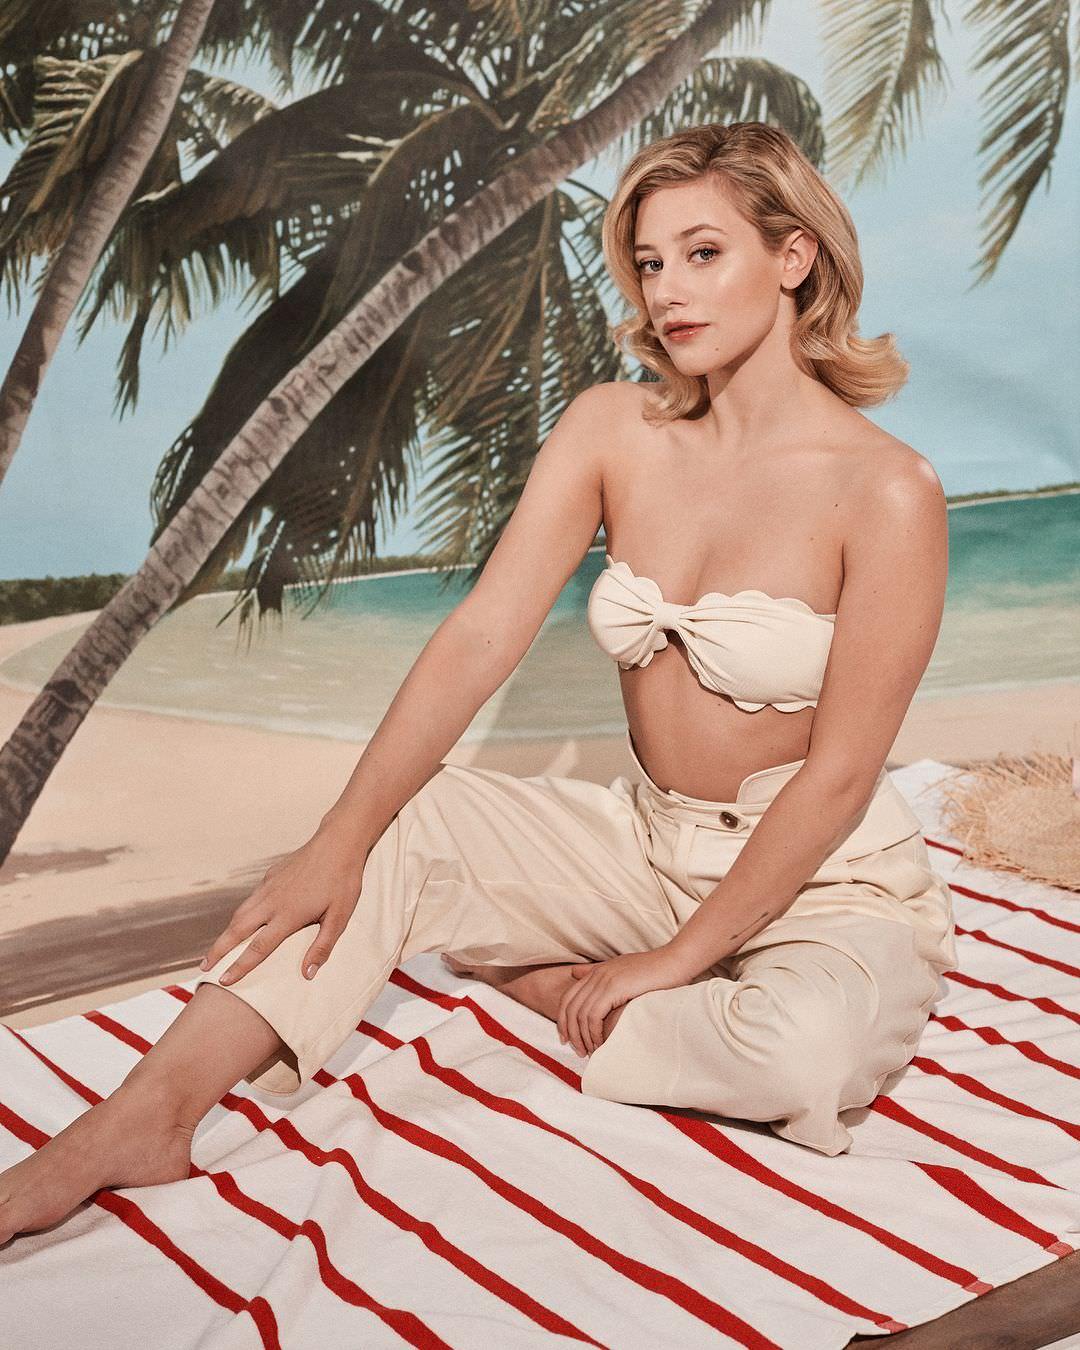 Лили Рейнхарт фото на пляже